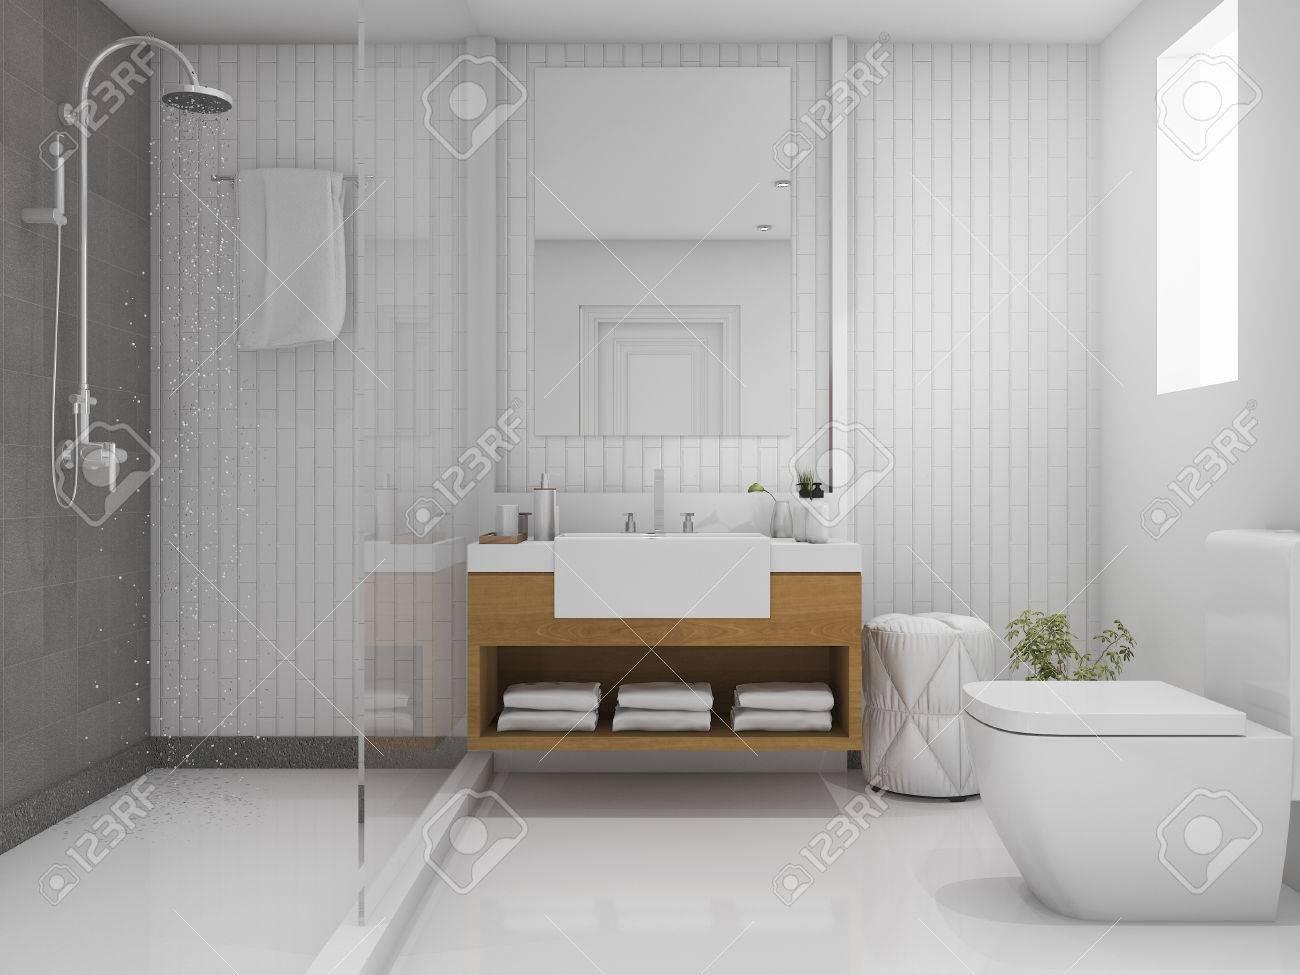 3d Rendering Brick Minimal Toilet And Bathroom Stock Photo